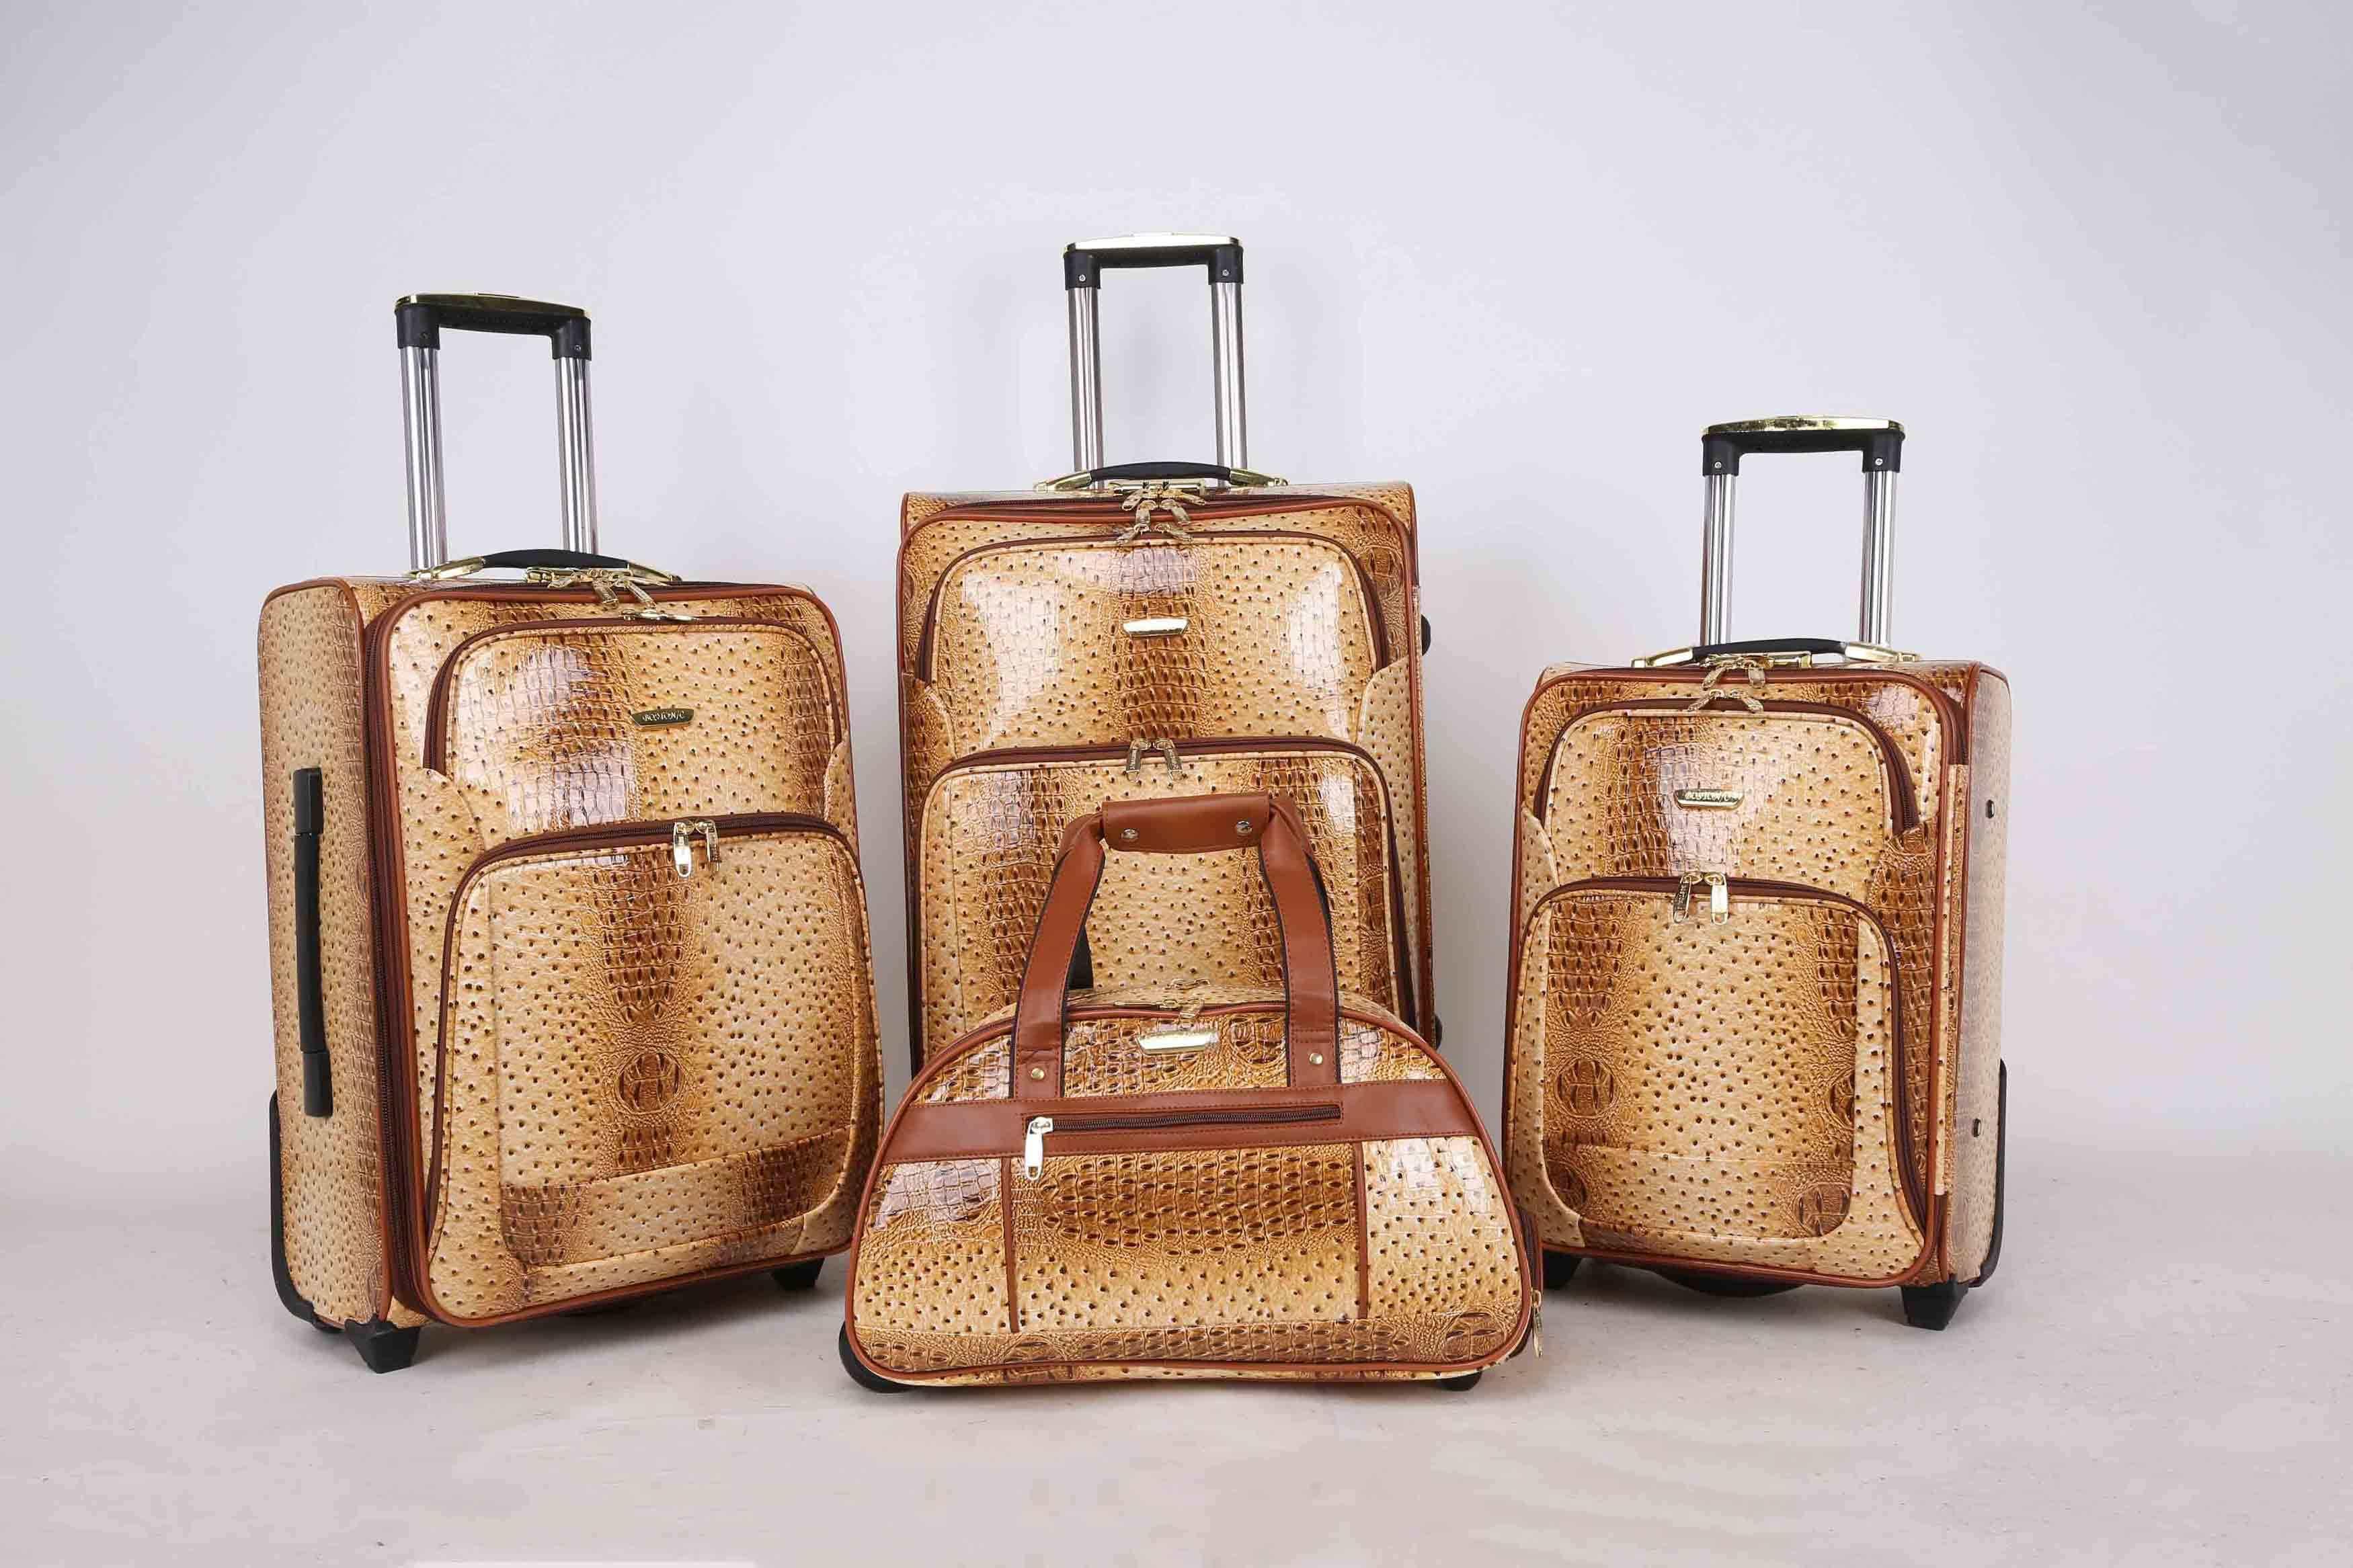 Africa Market Hotsale Luggage Trolley Case Jb010